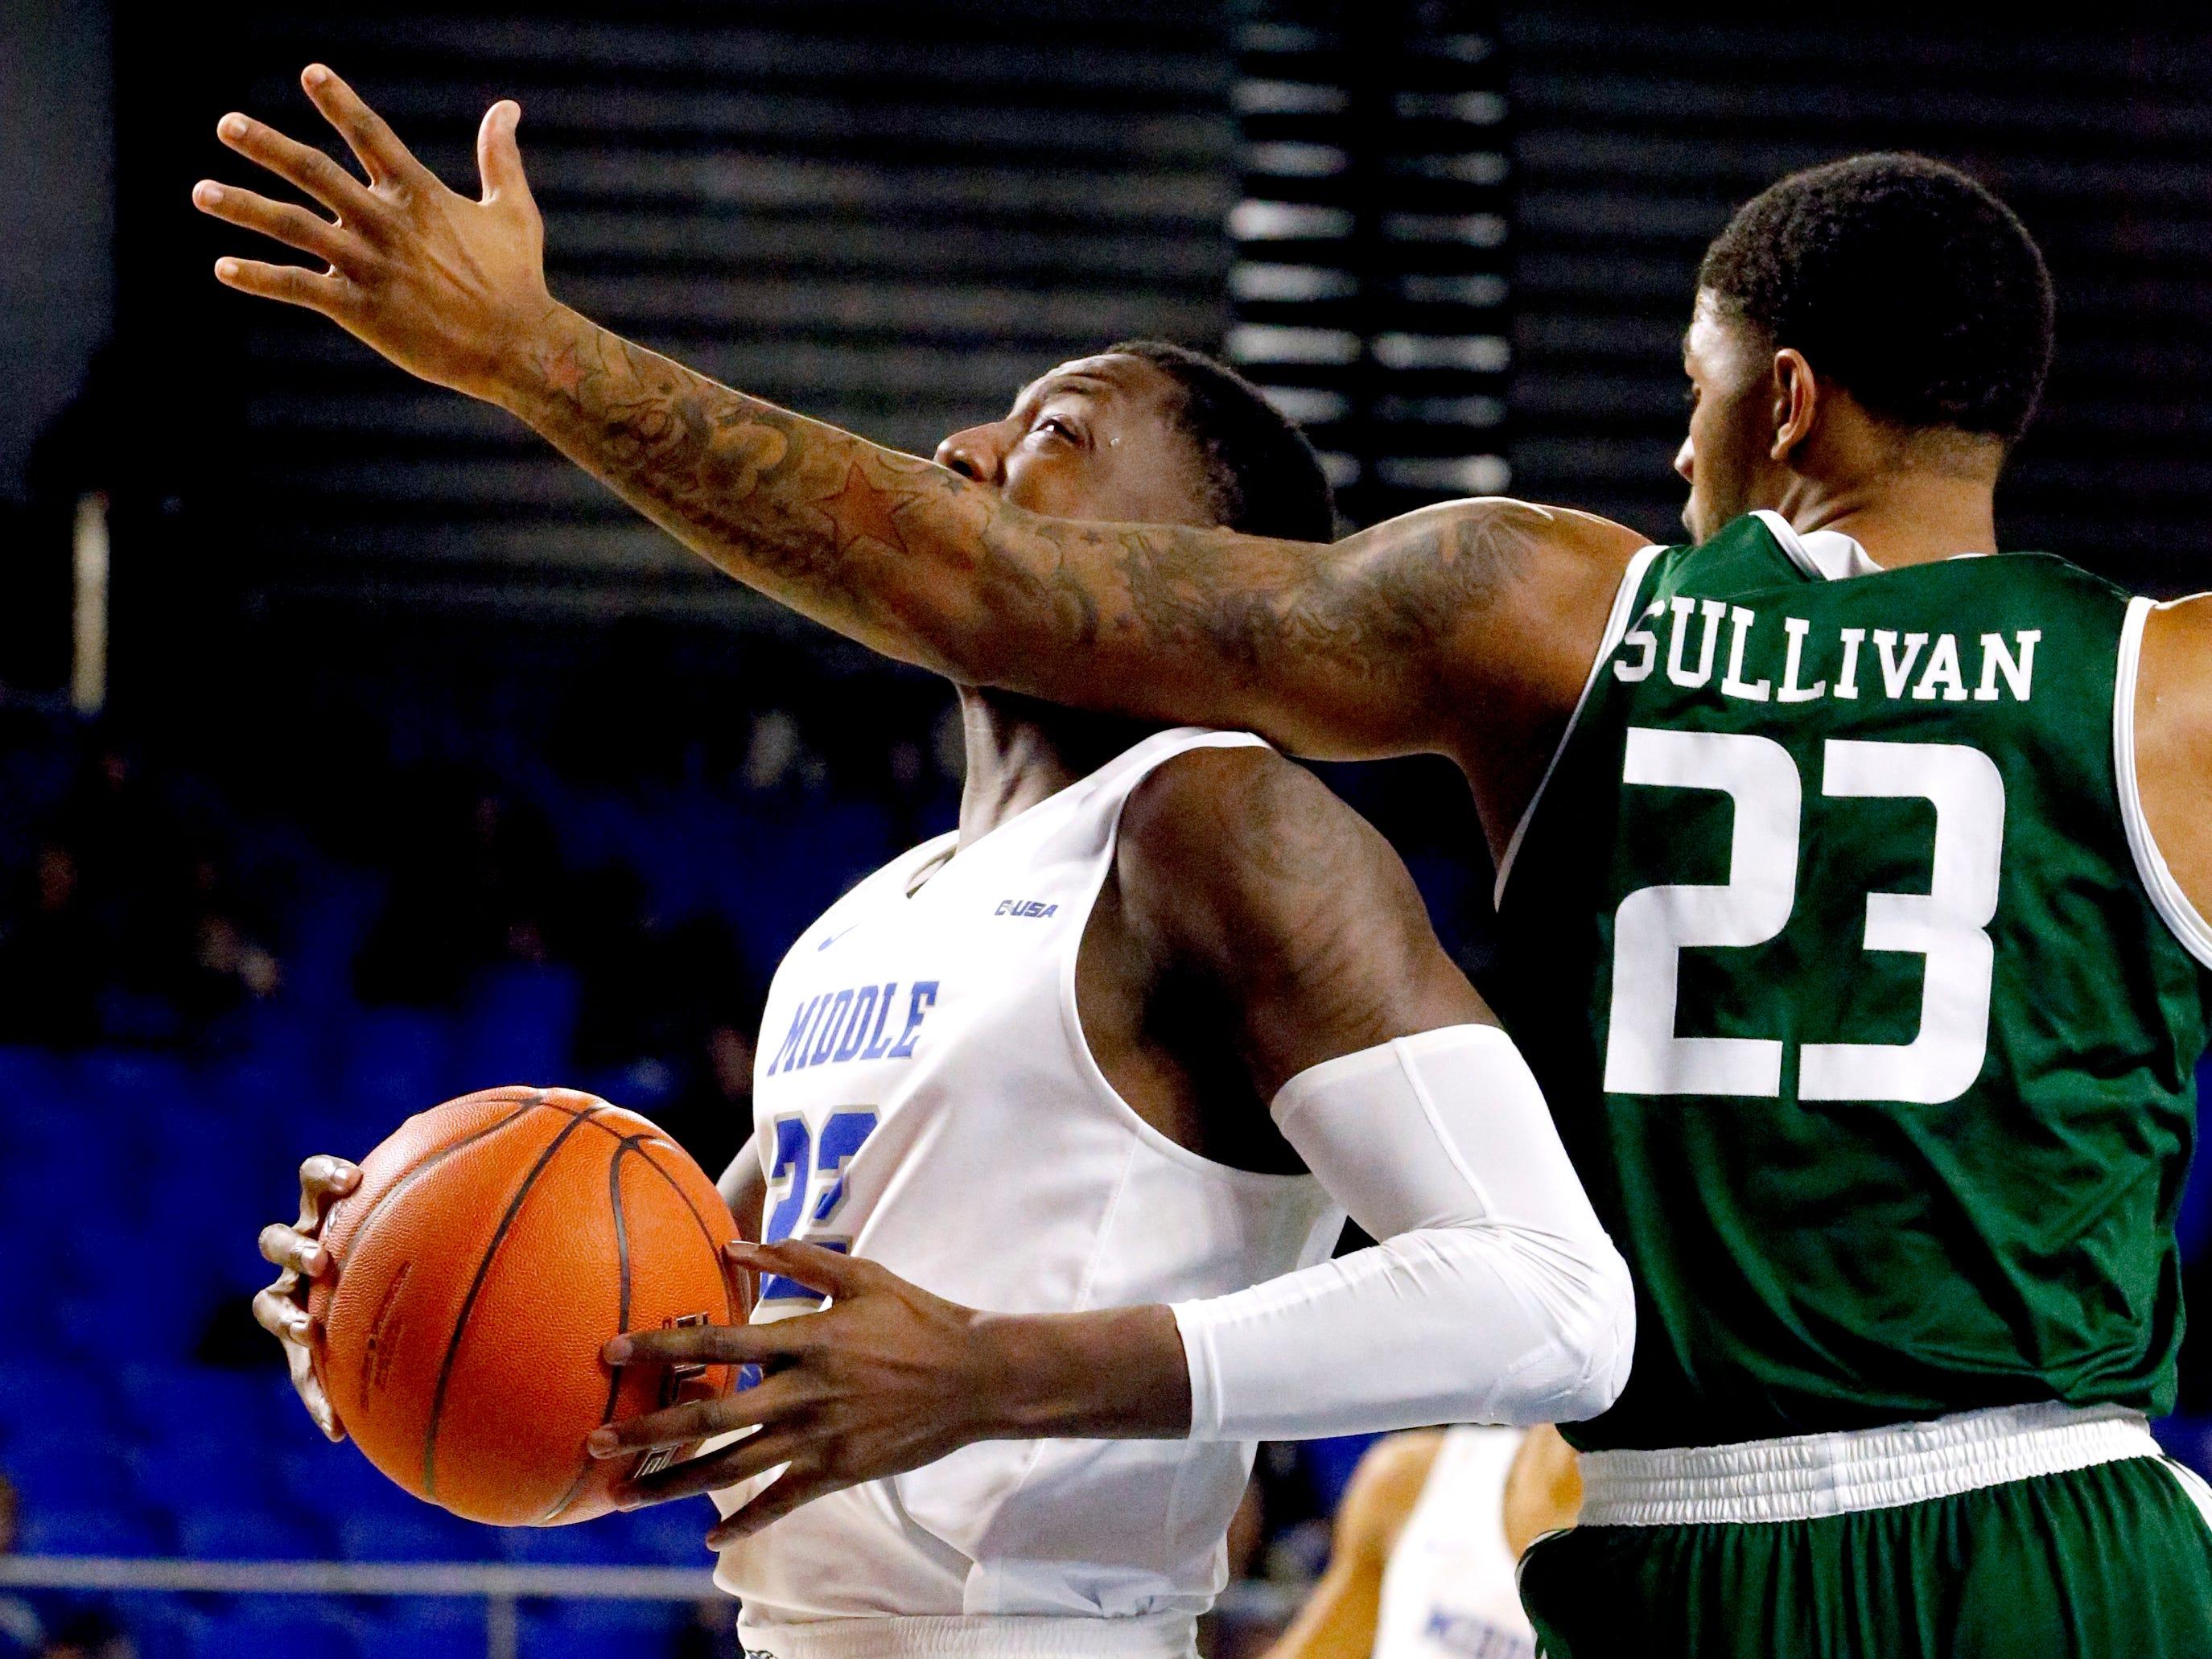 MTSU guard C.J. Jones (23) drives to the basket as UAB's forward Lewis Sullivan (23) guards him on Wednesday Jan. 30, 2019.